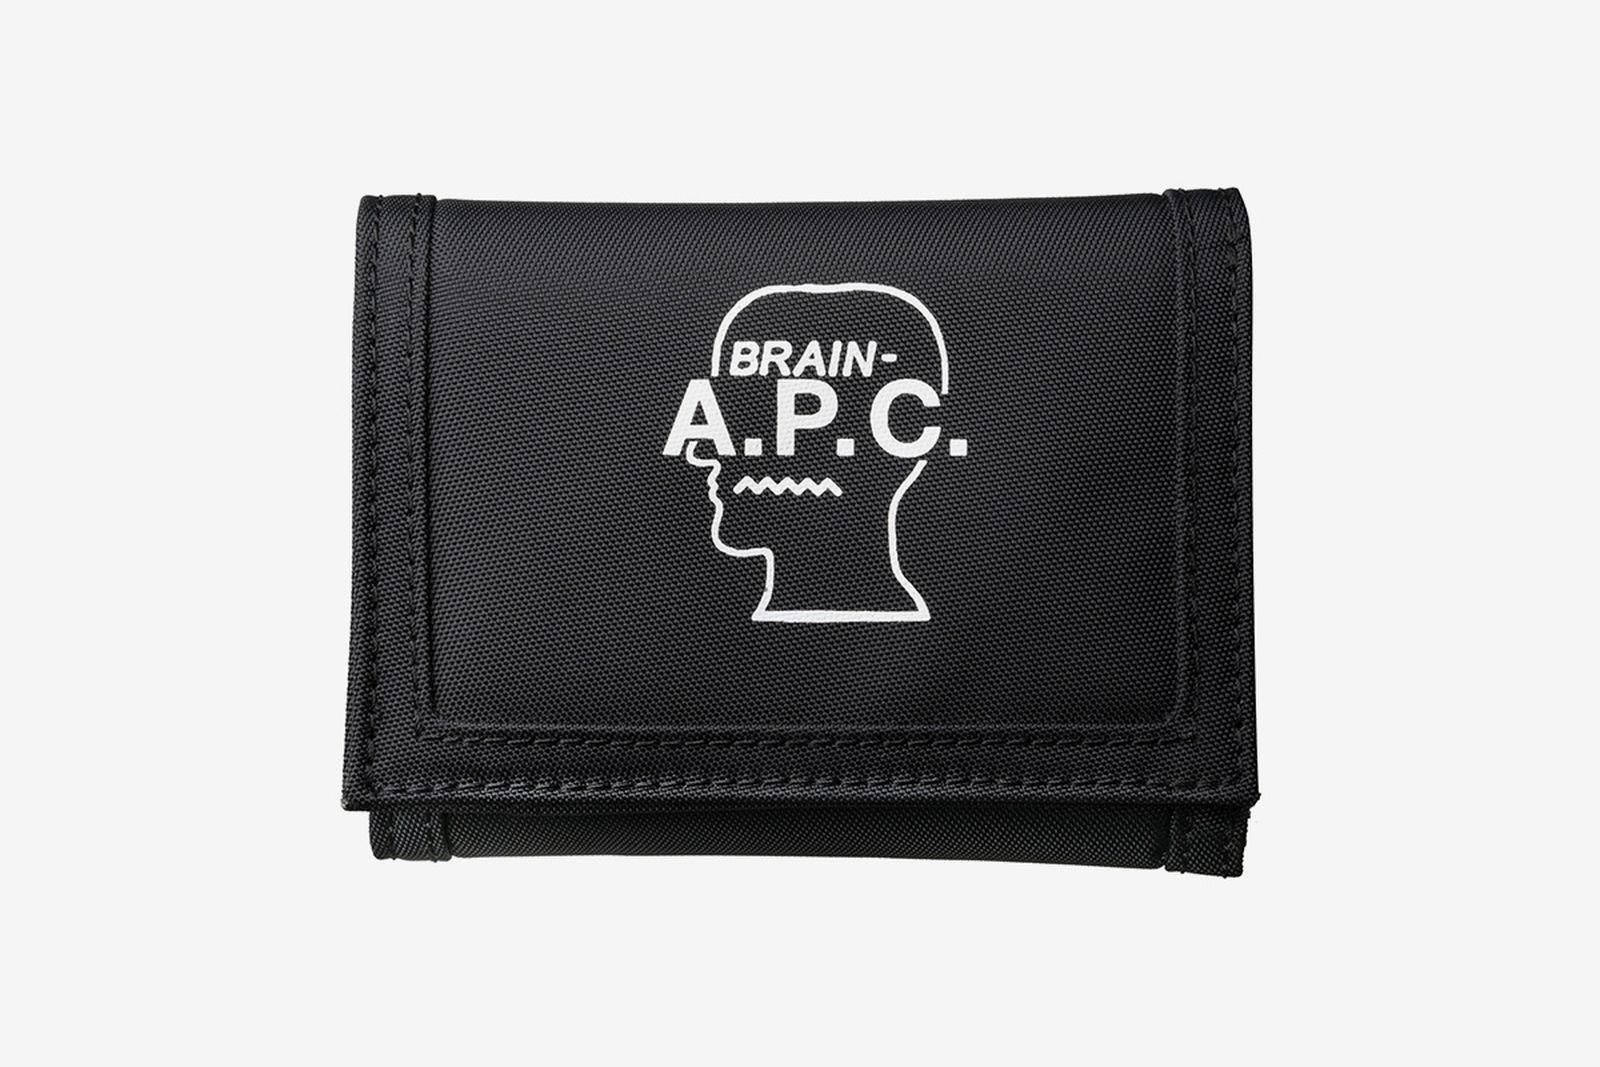 apc brain dead interaction 3 highsnobiety